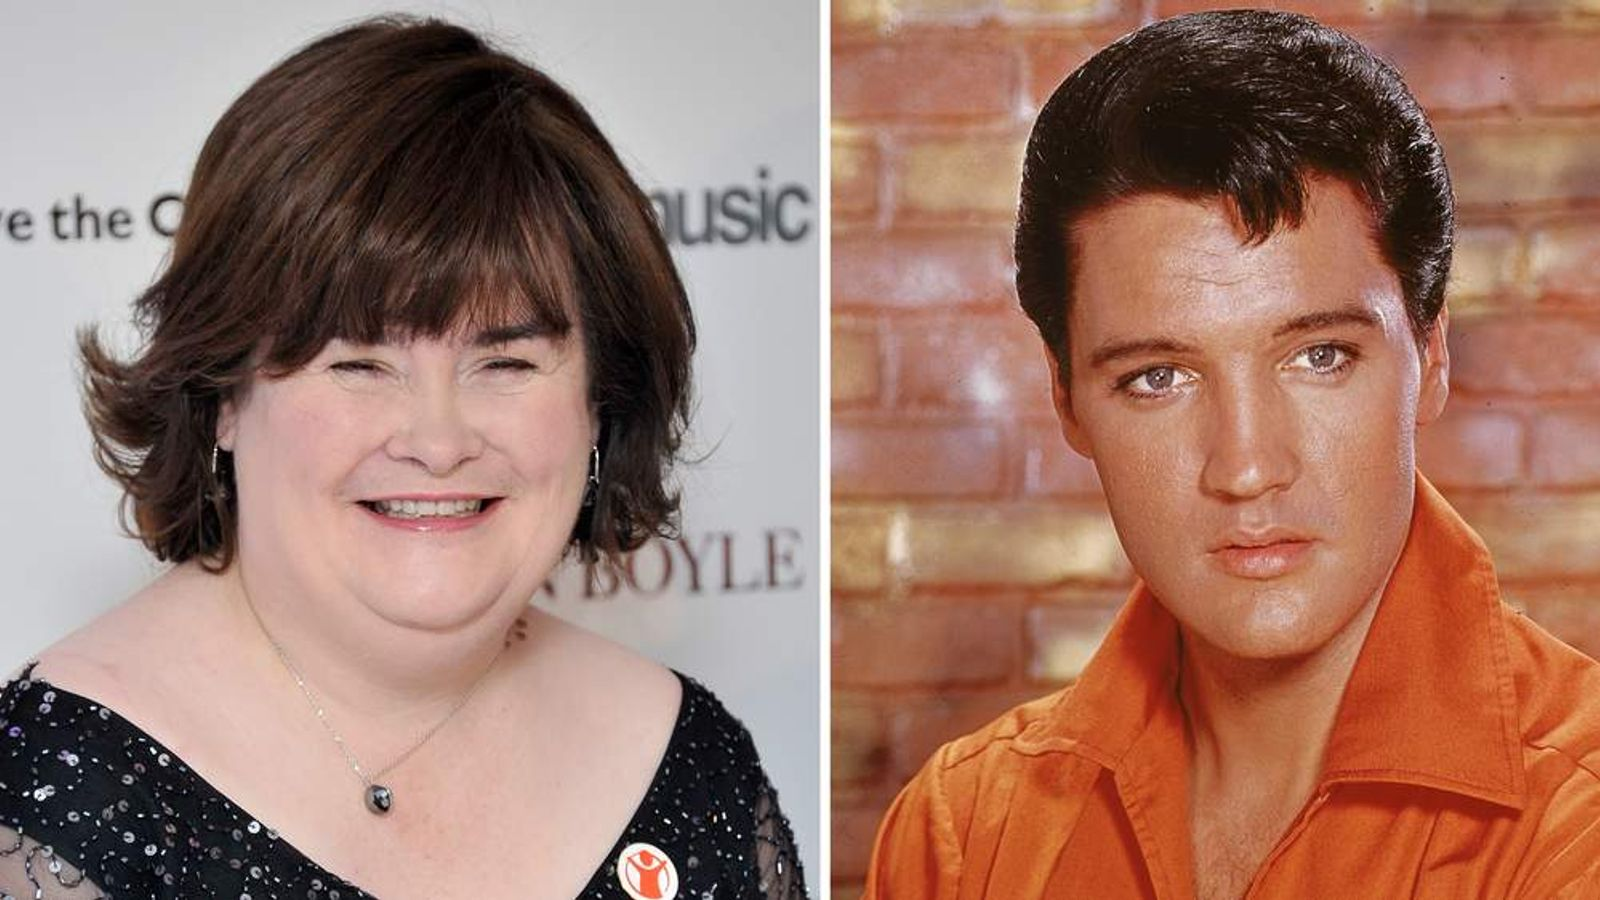 Susan Boyle & Syco Music Make Special Announcement